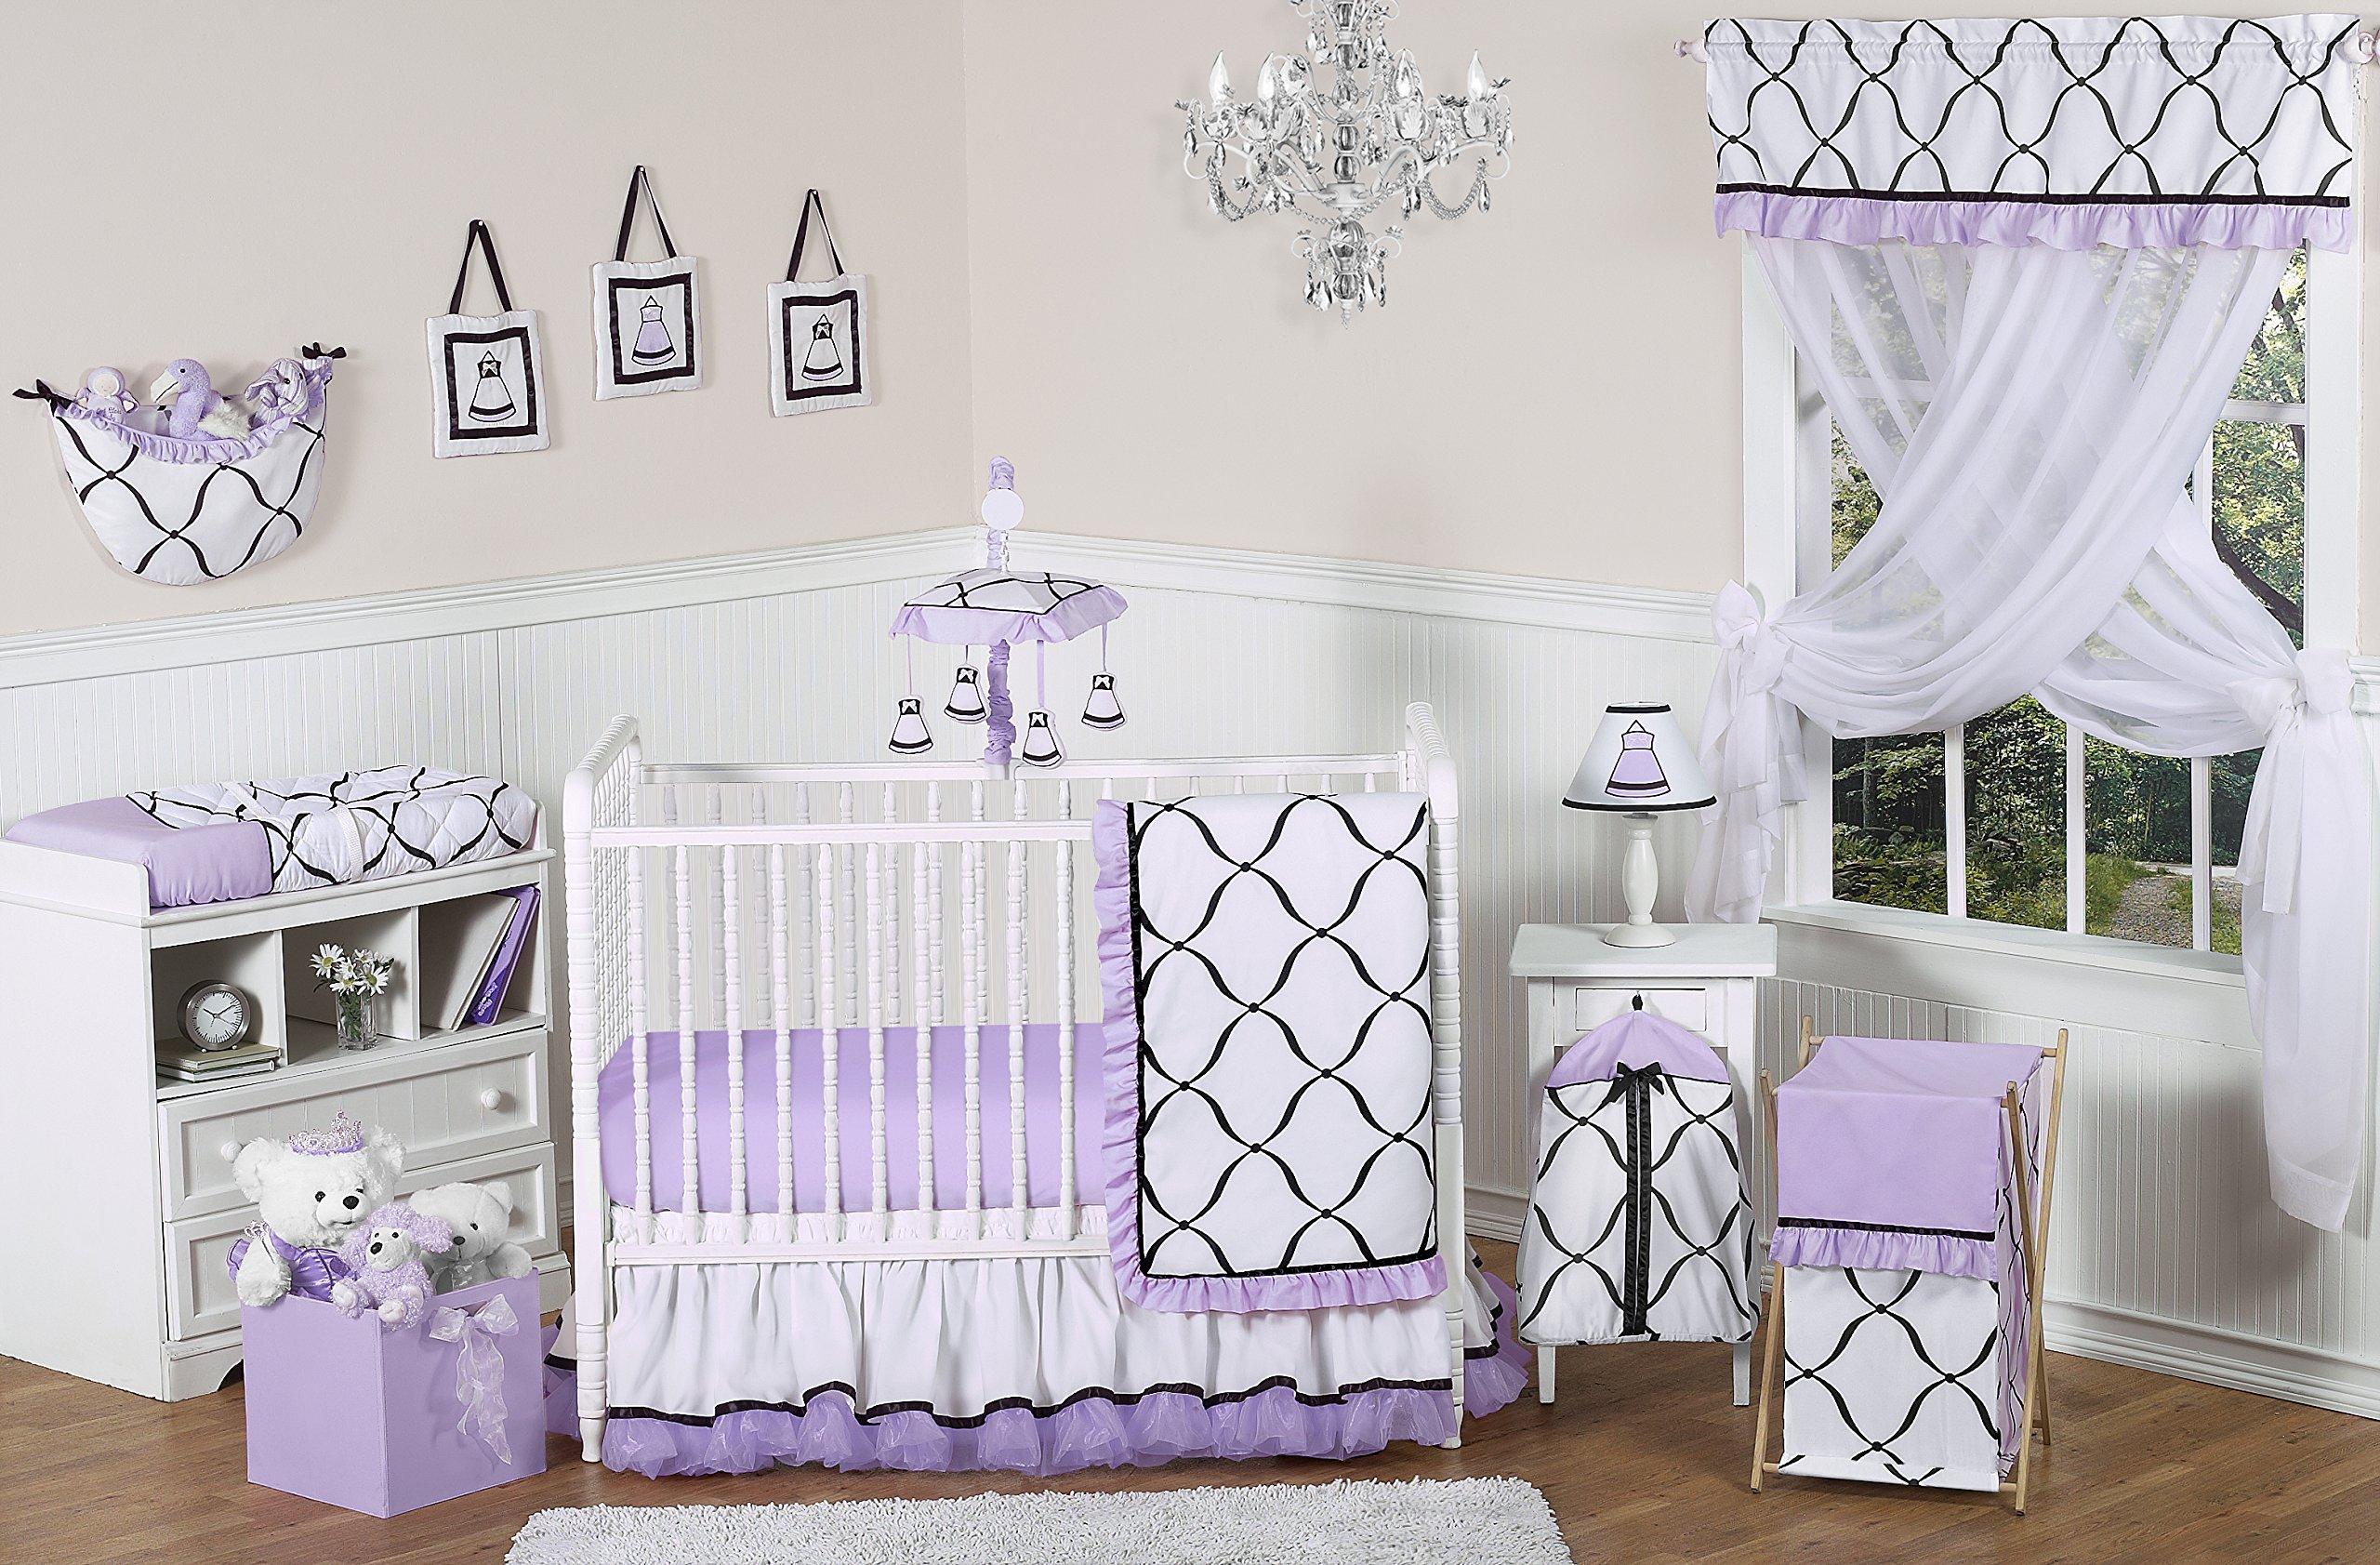 Amazon.com: Sweet Jojo Designs Purple, Black And White Princess Baby Changing Pad Cover: Baby